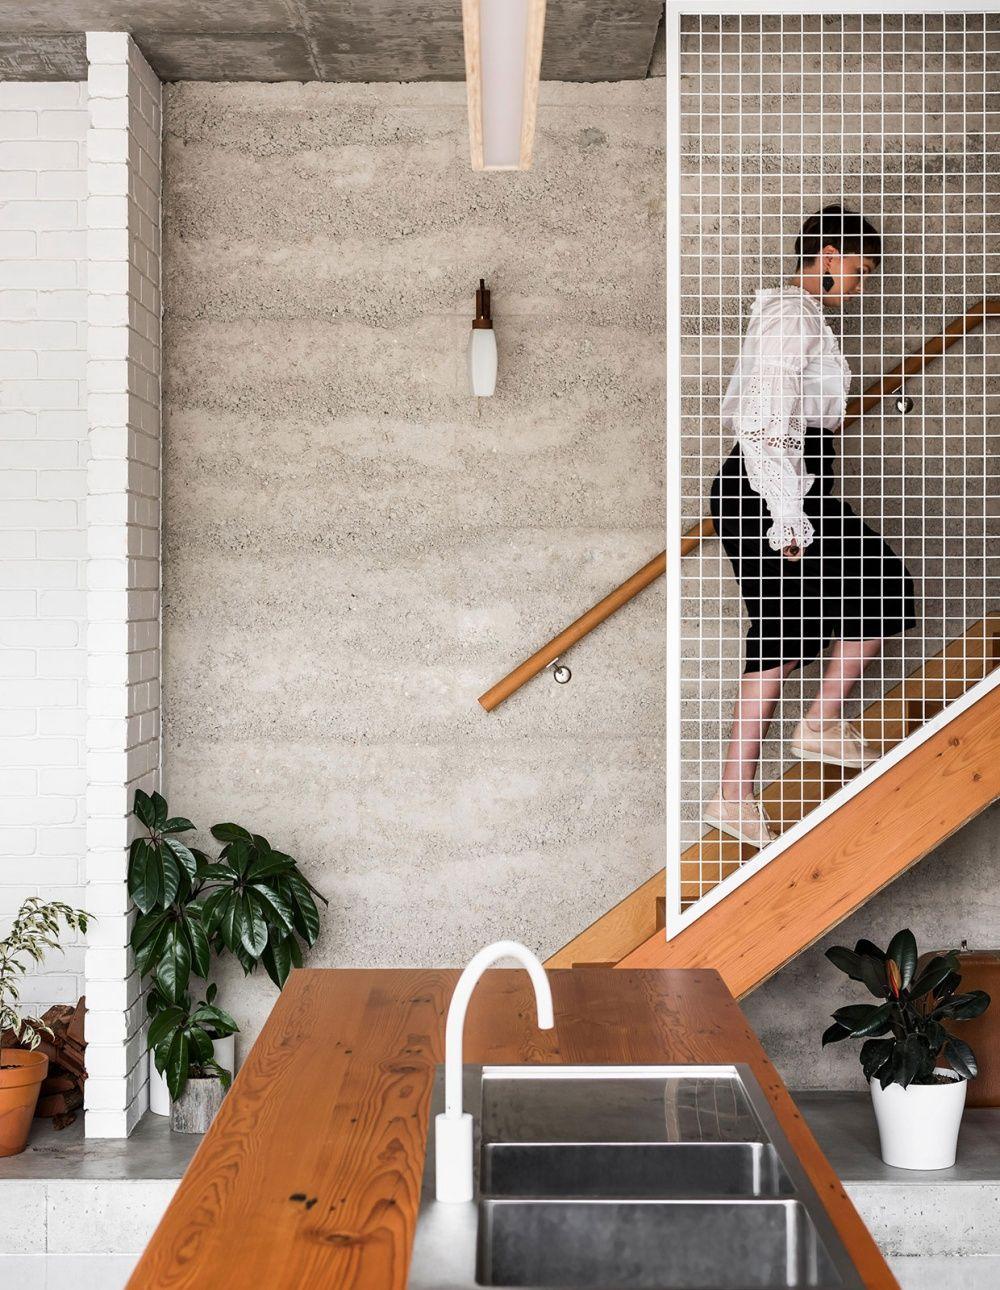 Eco House Western Australia | Escalera, Interiores y Arquitetura